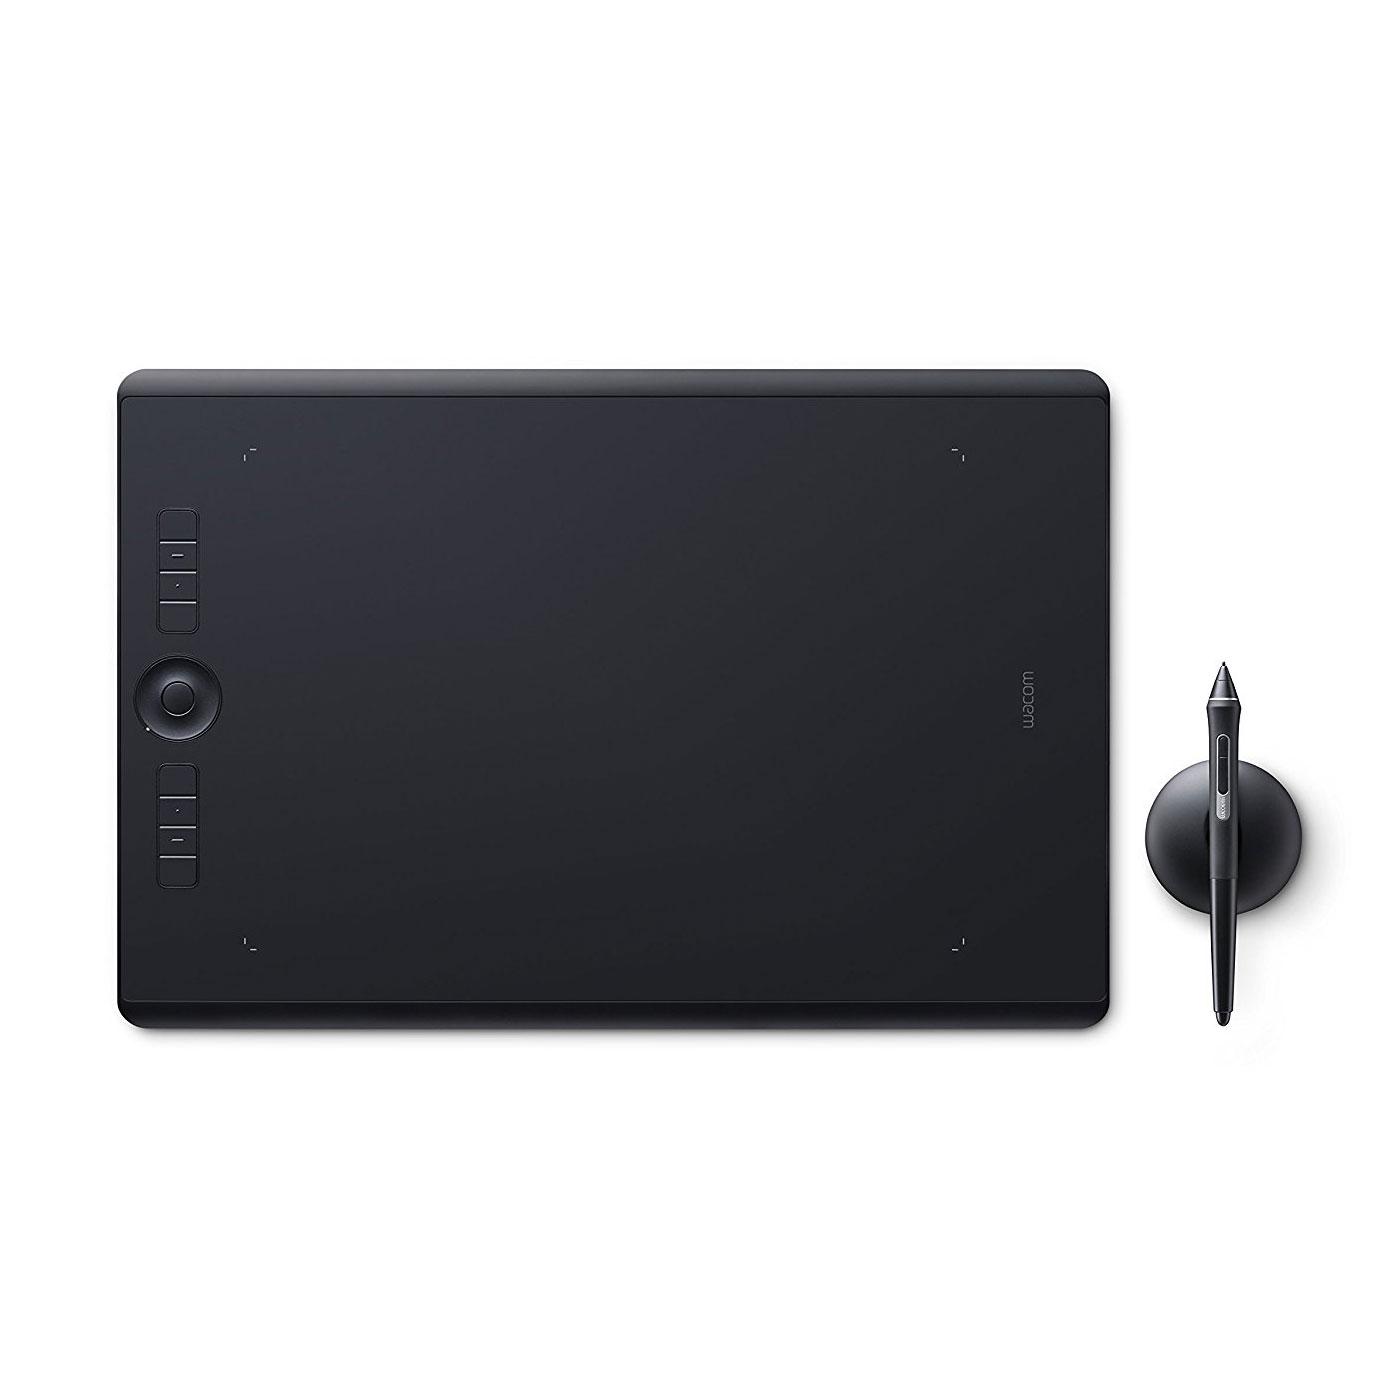 Wacom Intuos PRO Medium - Tablette graphique Wacom - Cybertek.fr - 0